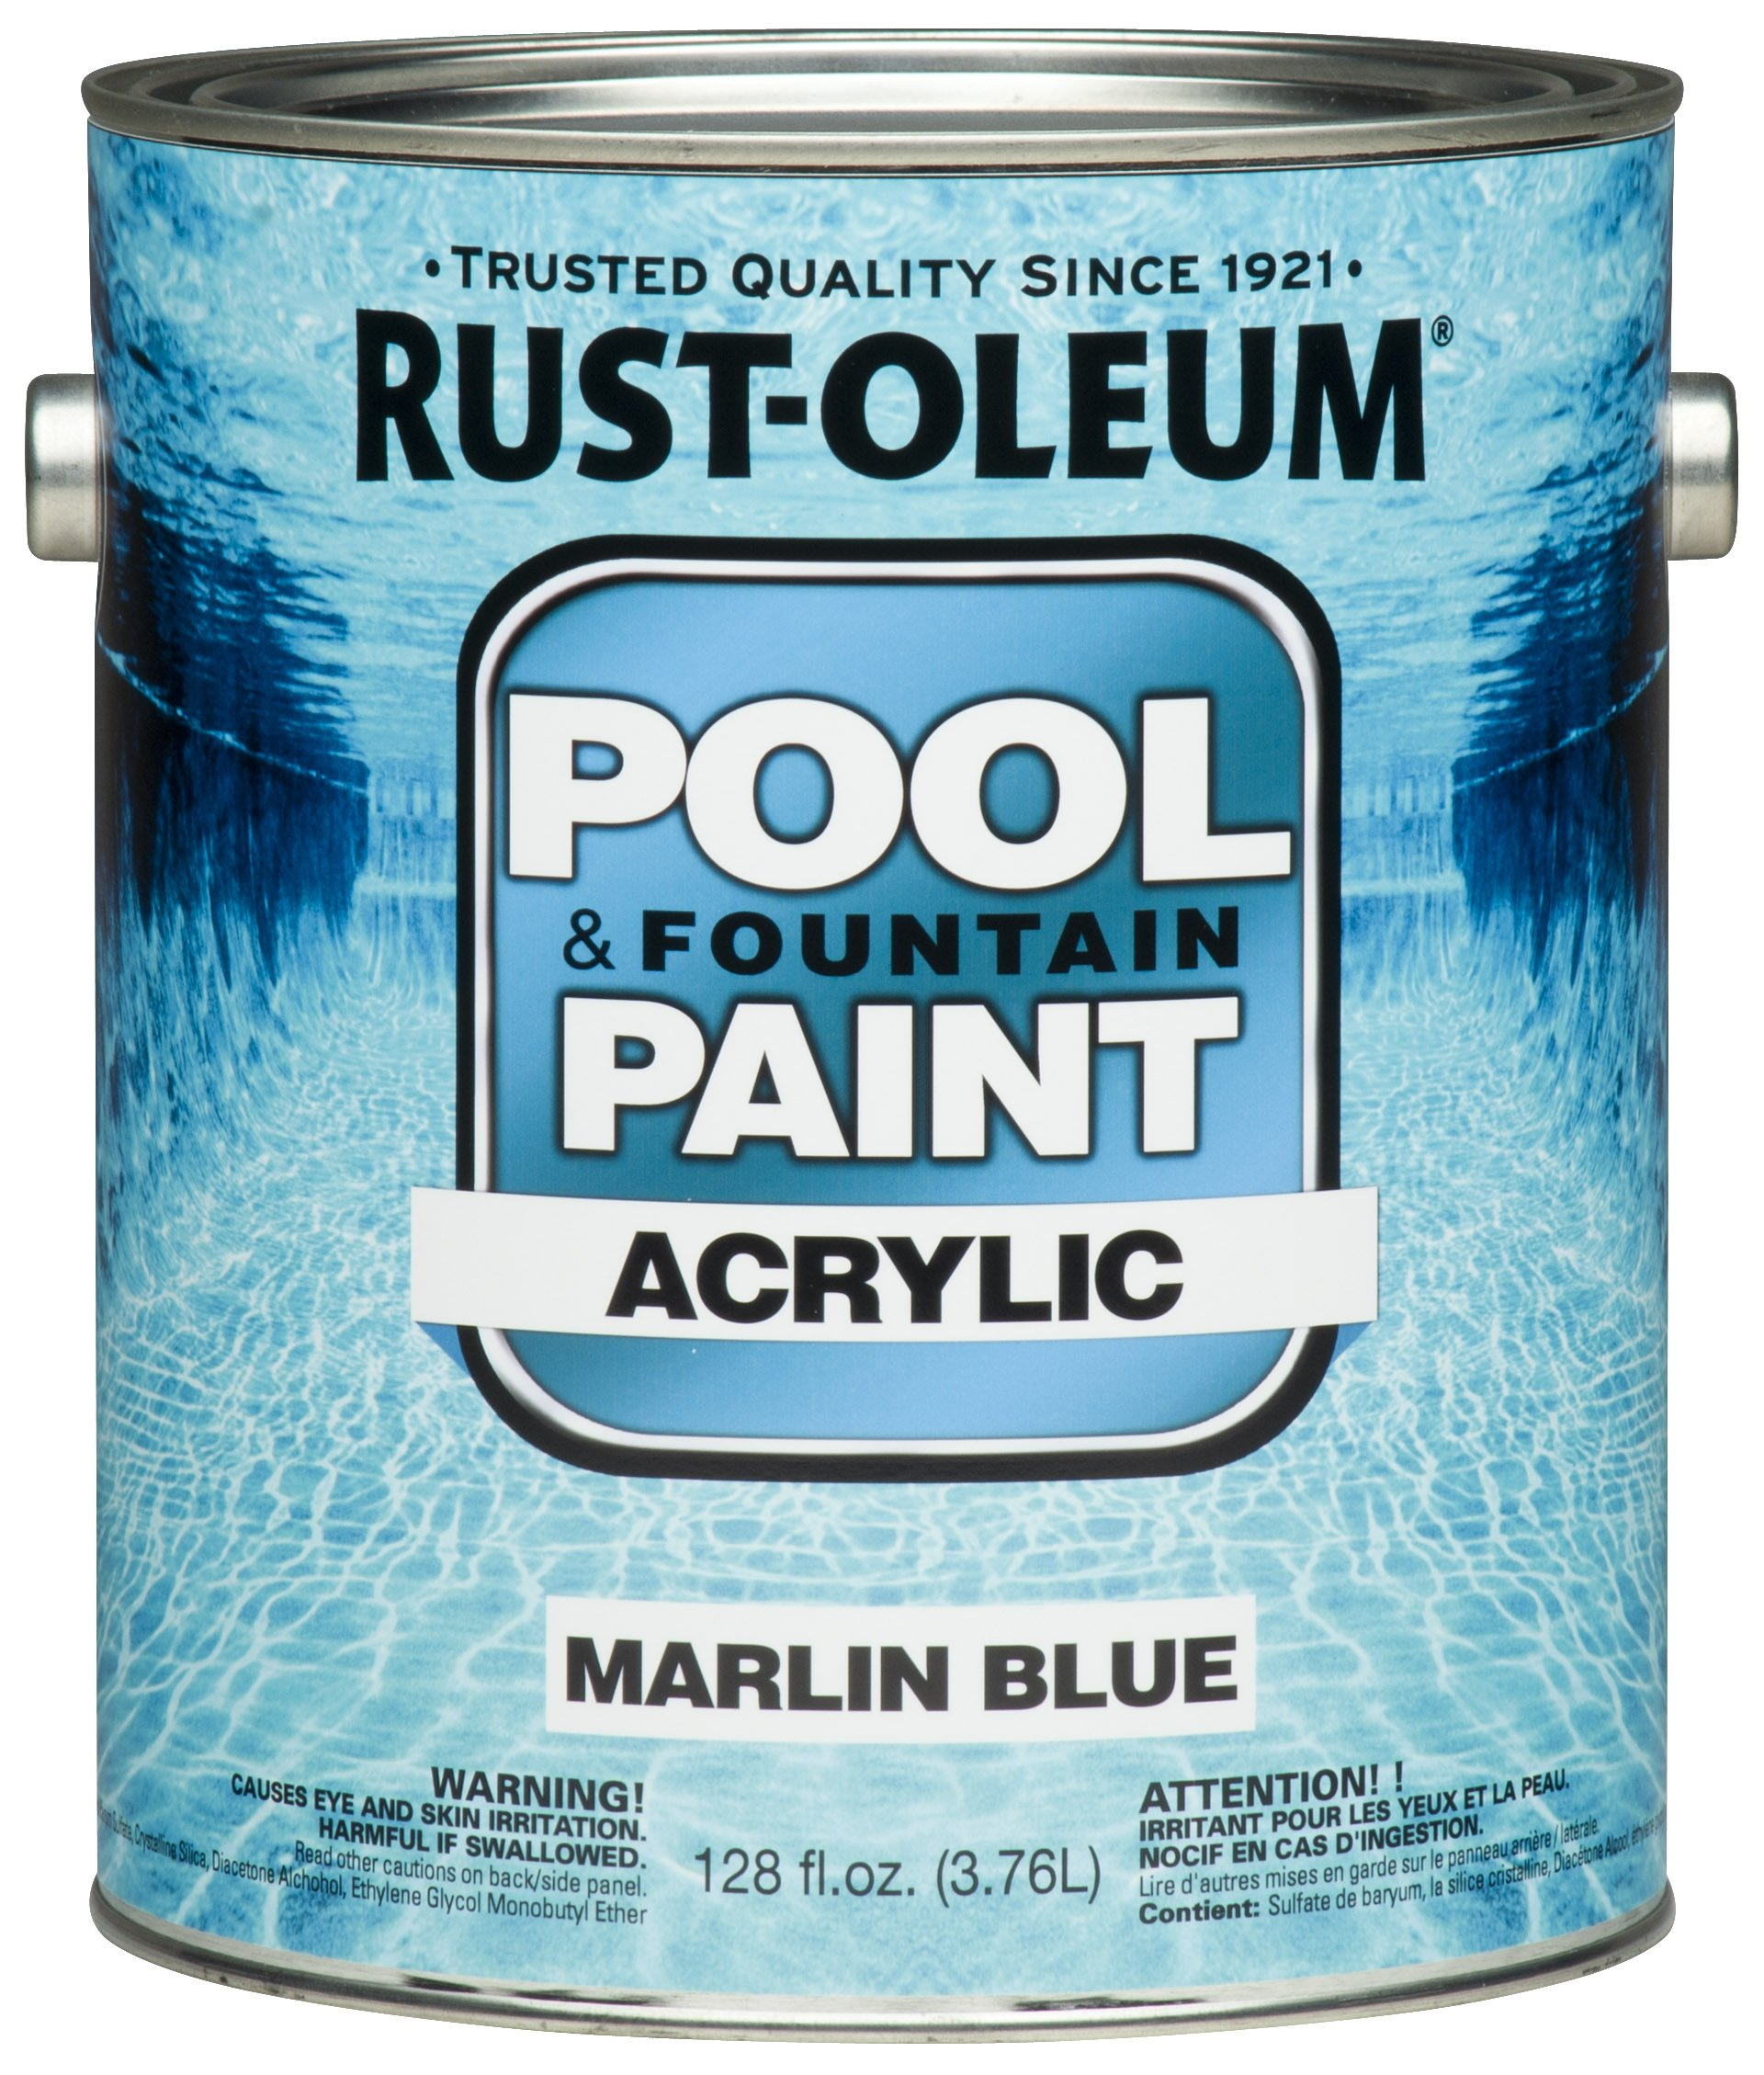 Rust-Oleum 269357 Acrylic Pool and Fountain Paint, 1-Gallon, Marlin Blue, 2-Pack